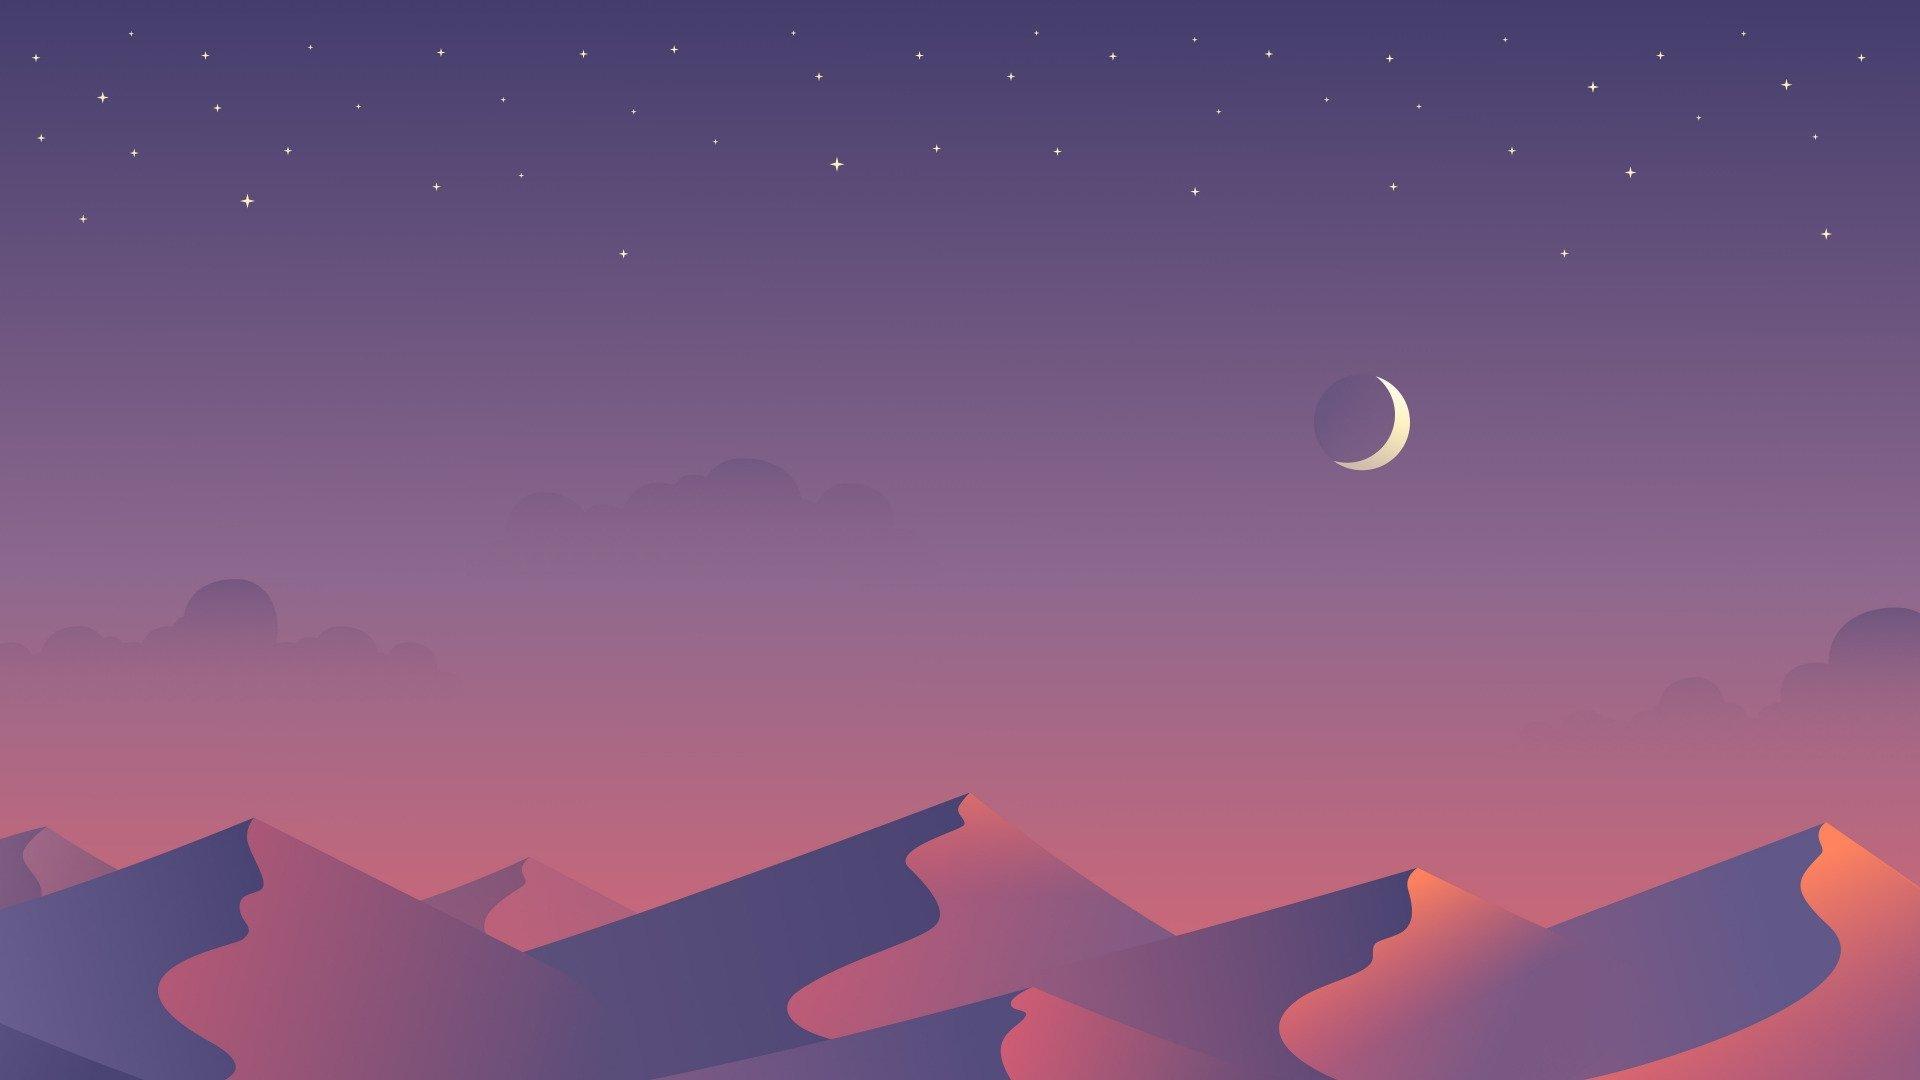 Aesthetic Moon Wallpaper 1920x1080